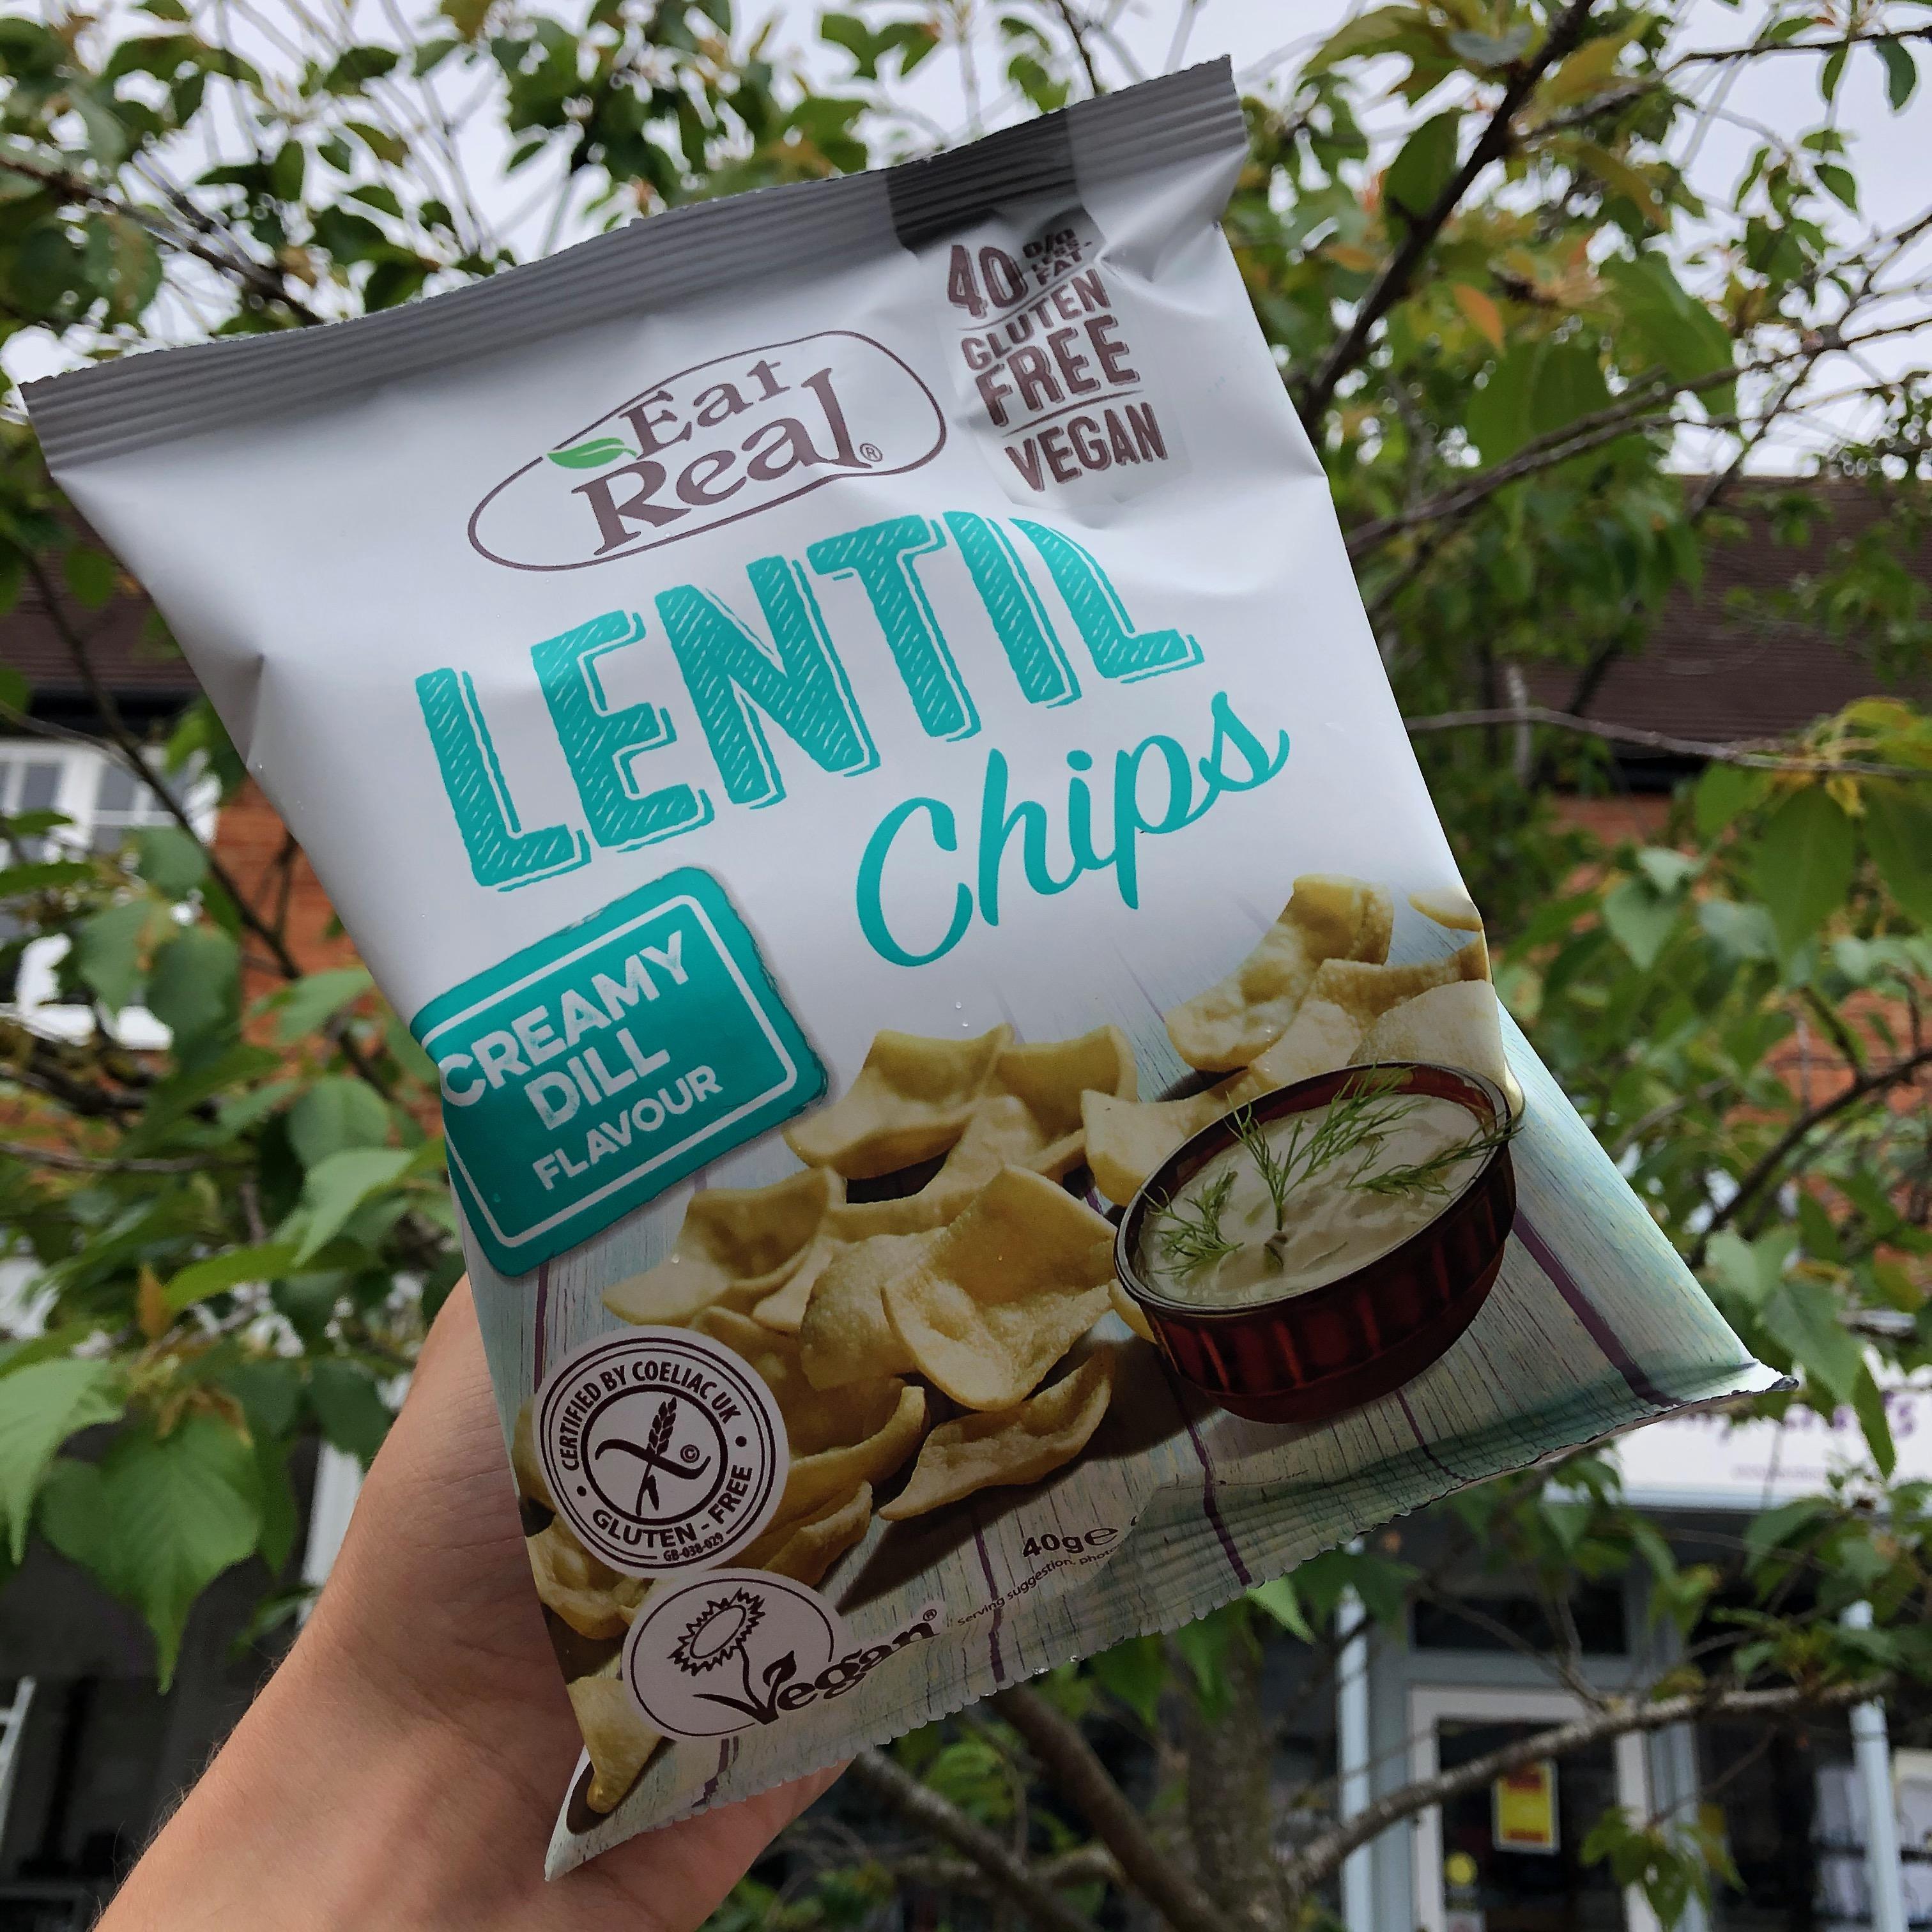 Lentil Chips - Creamy Dill 40g